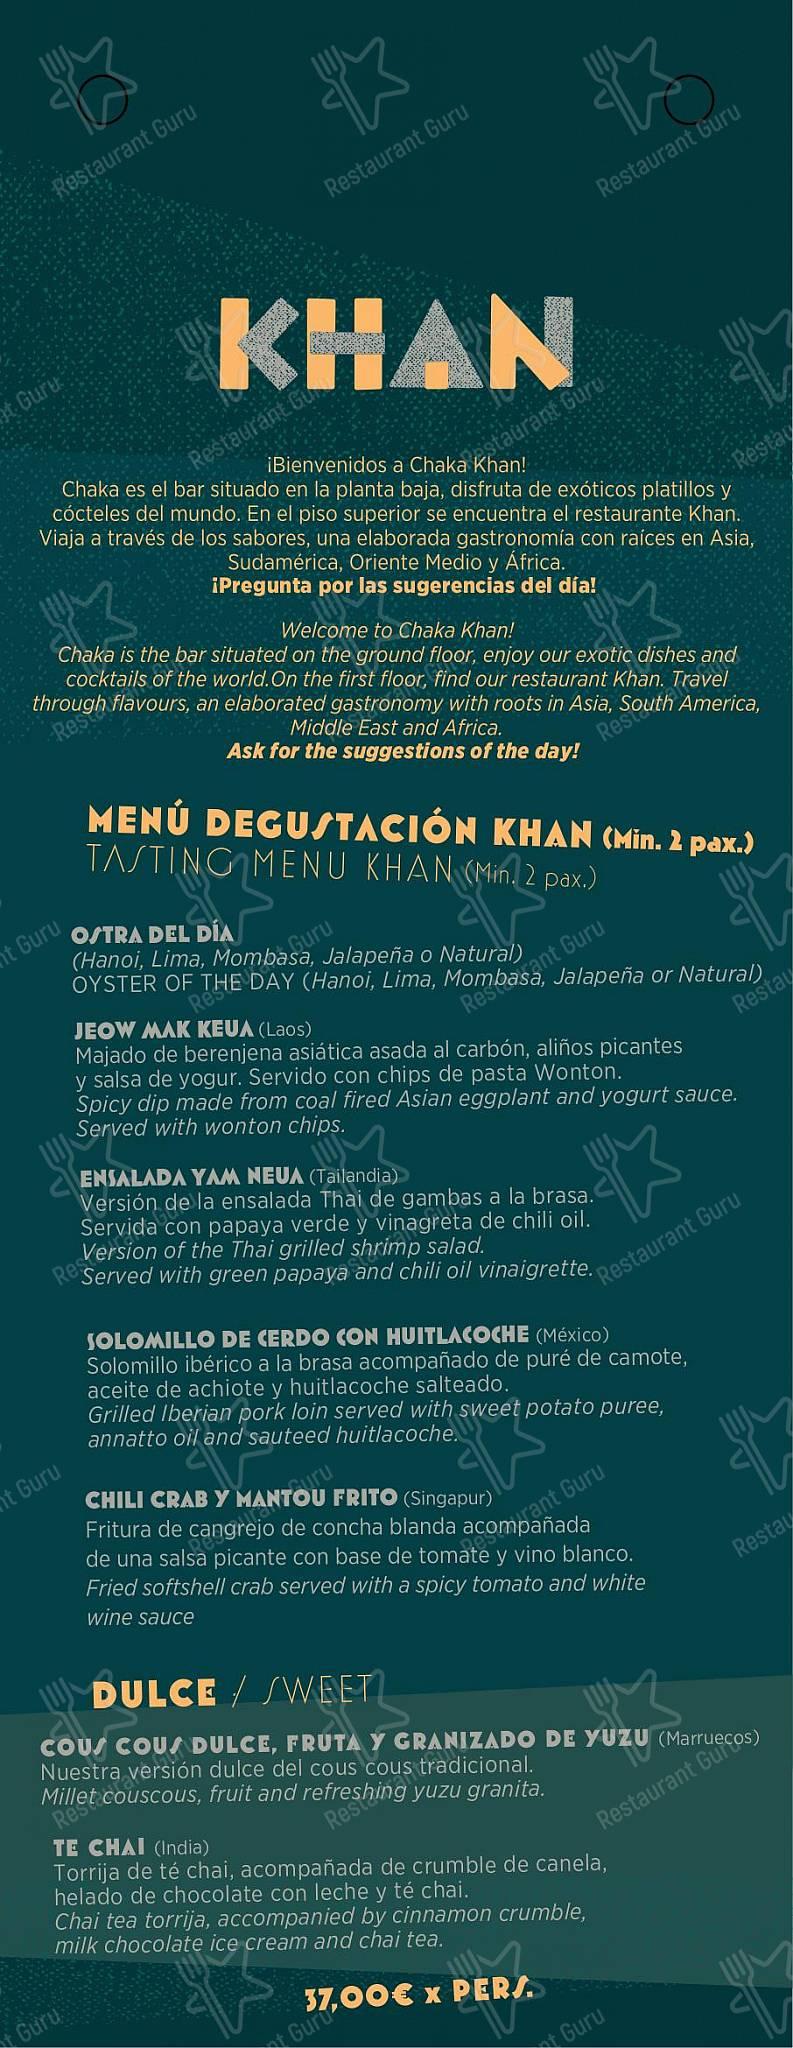 Chaka Khan - Gastro Bar Exotique menu - meals and drinks